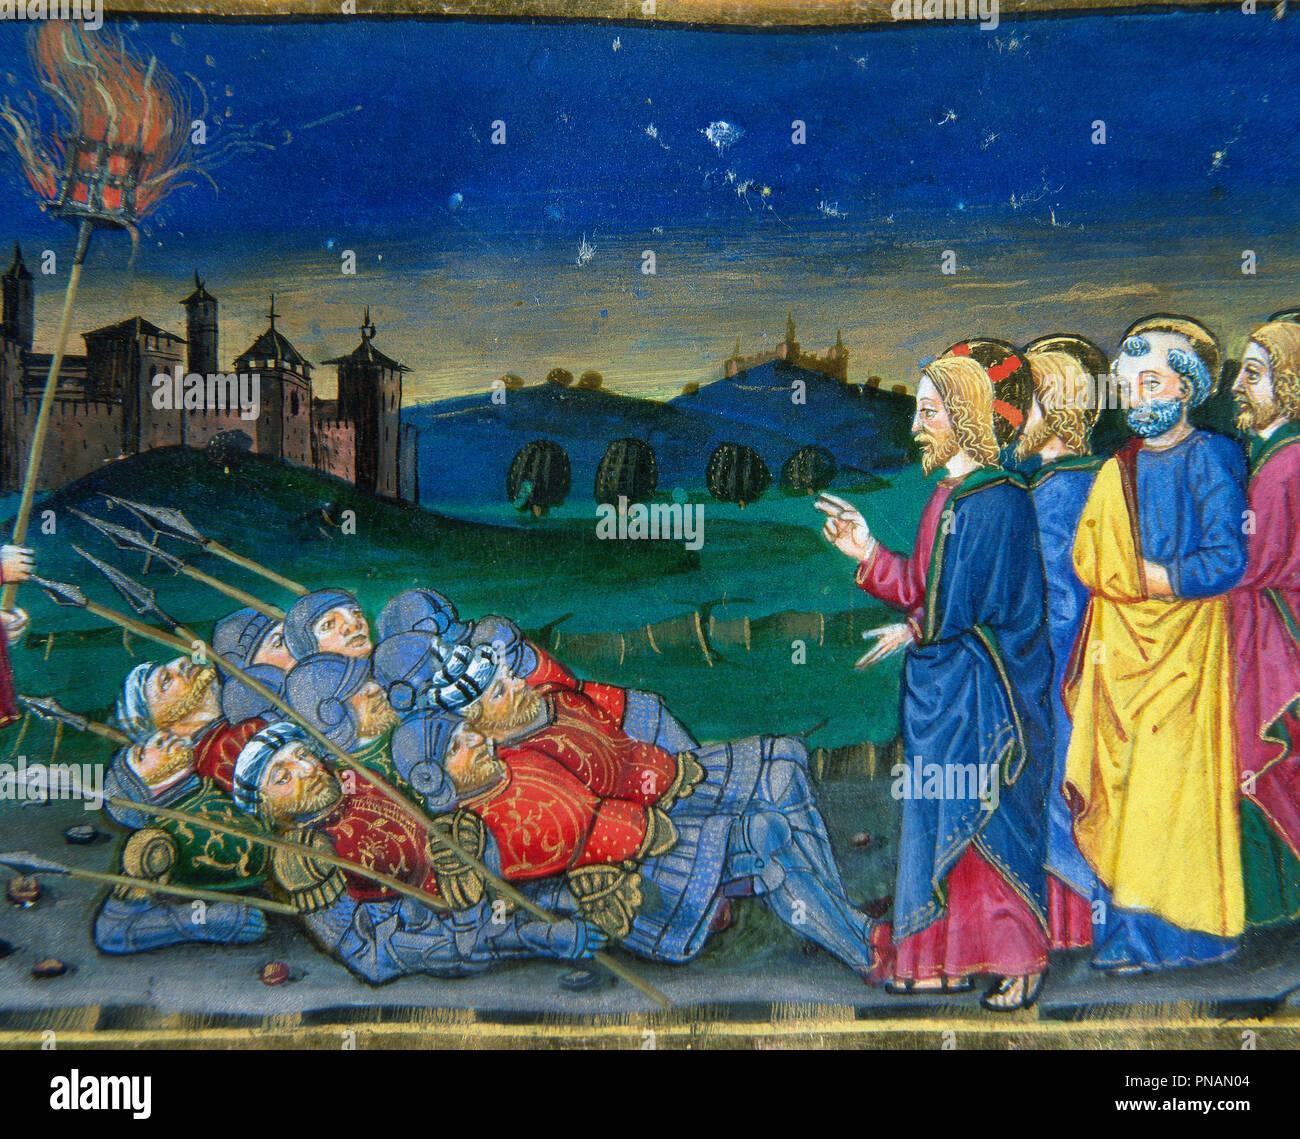 Cristoforo de Predis (1440-1486). Italian miniaturist. Jesus, who knew everything, says to those who persecute him: I am Jesus of Nazareth. Miniature. Codex of Predis, 1476. Royal Library. Turin, Italy. - Stock Image